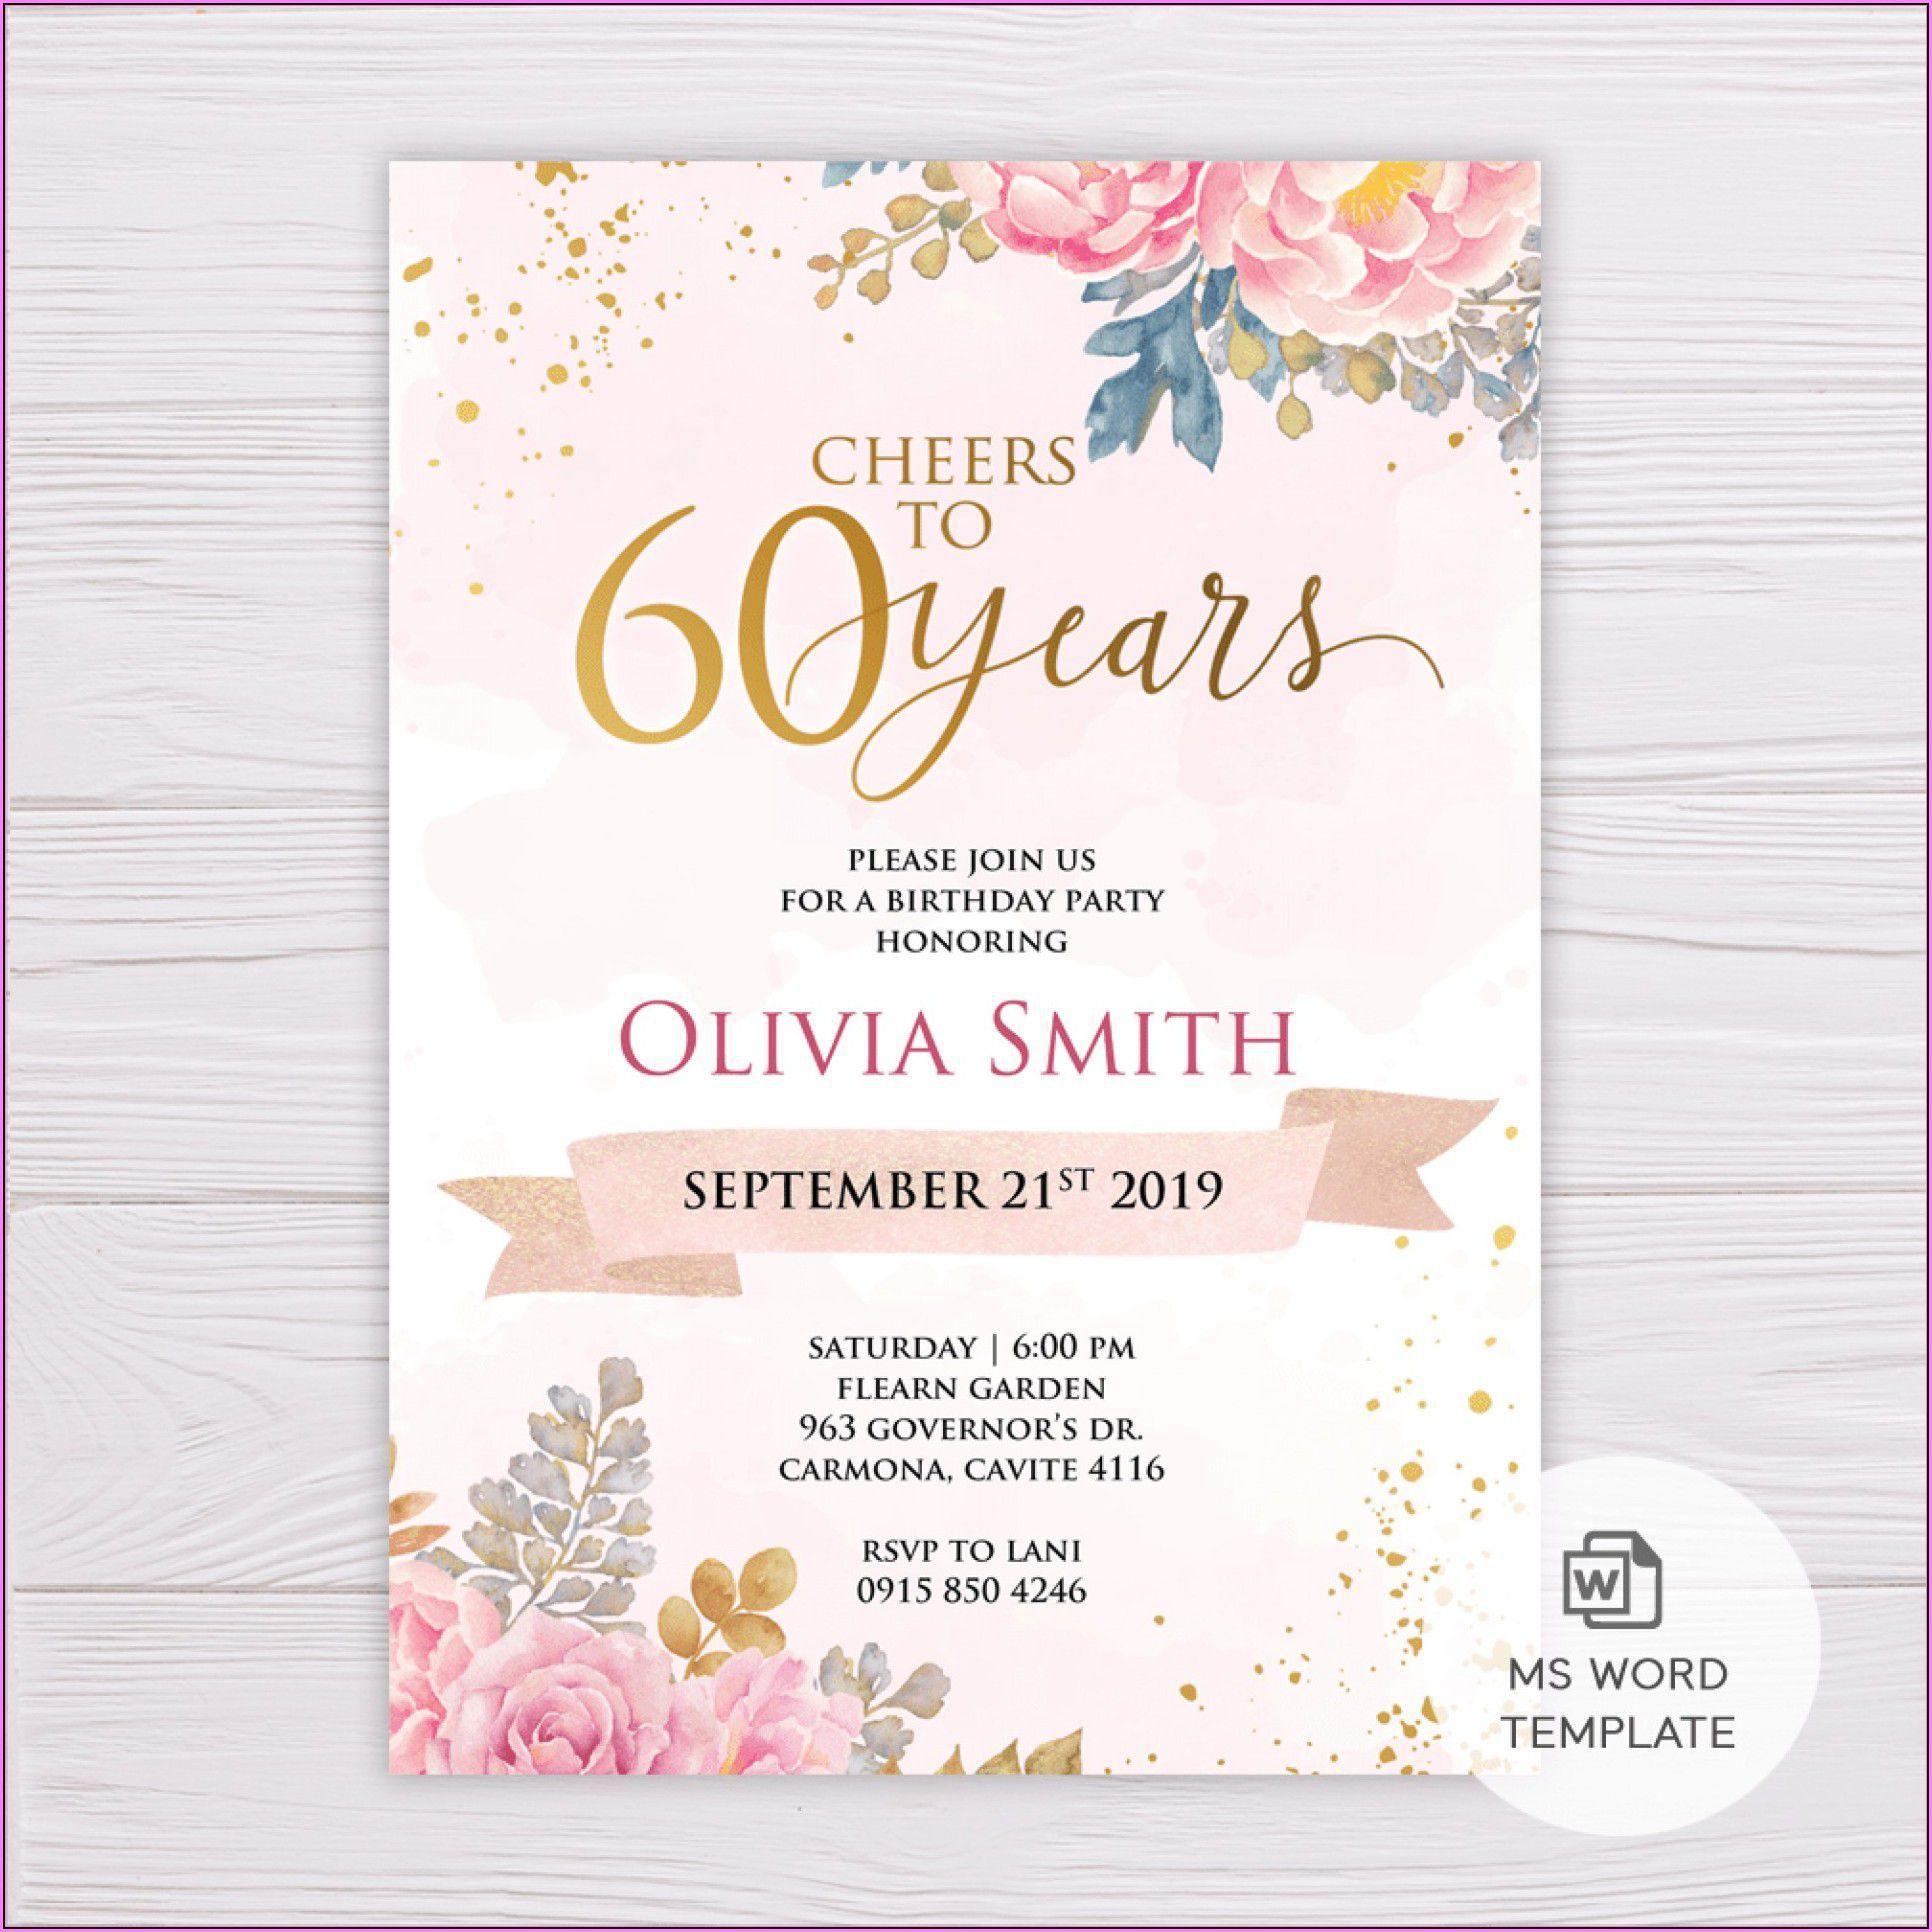 011 Wondrou 60 Birthday Invite Template High Definition  Templates 60th Printable FreeFull